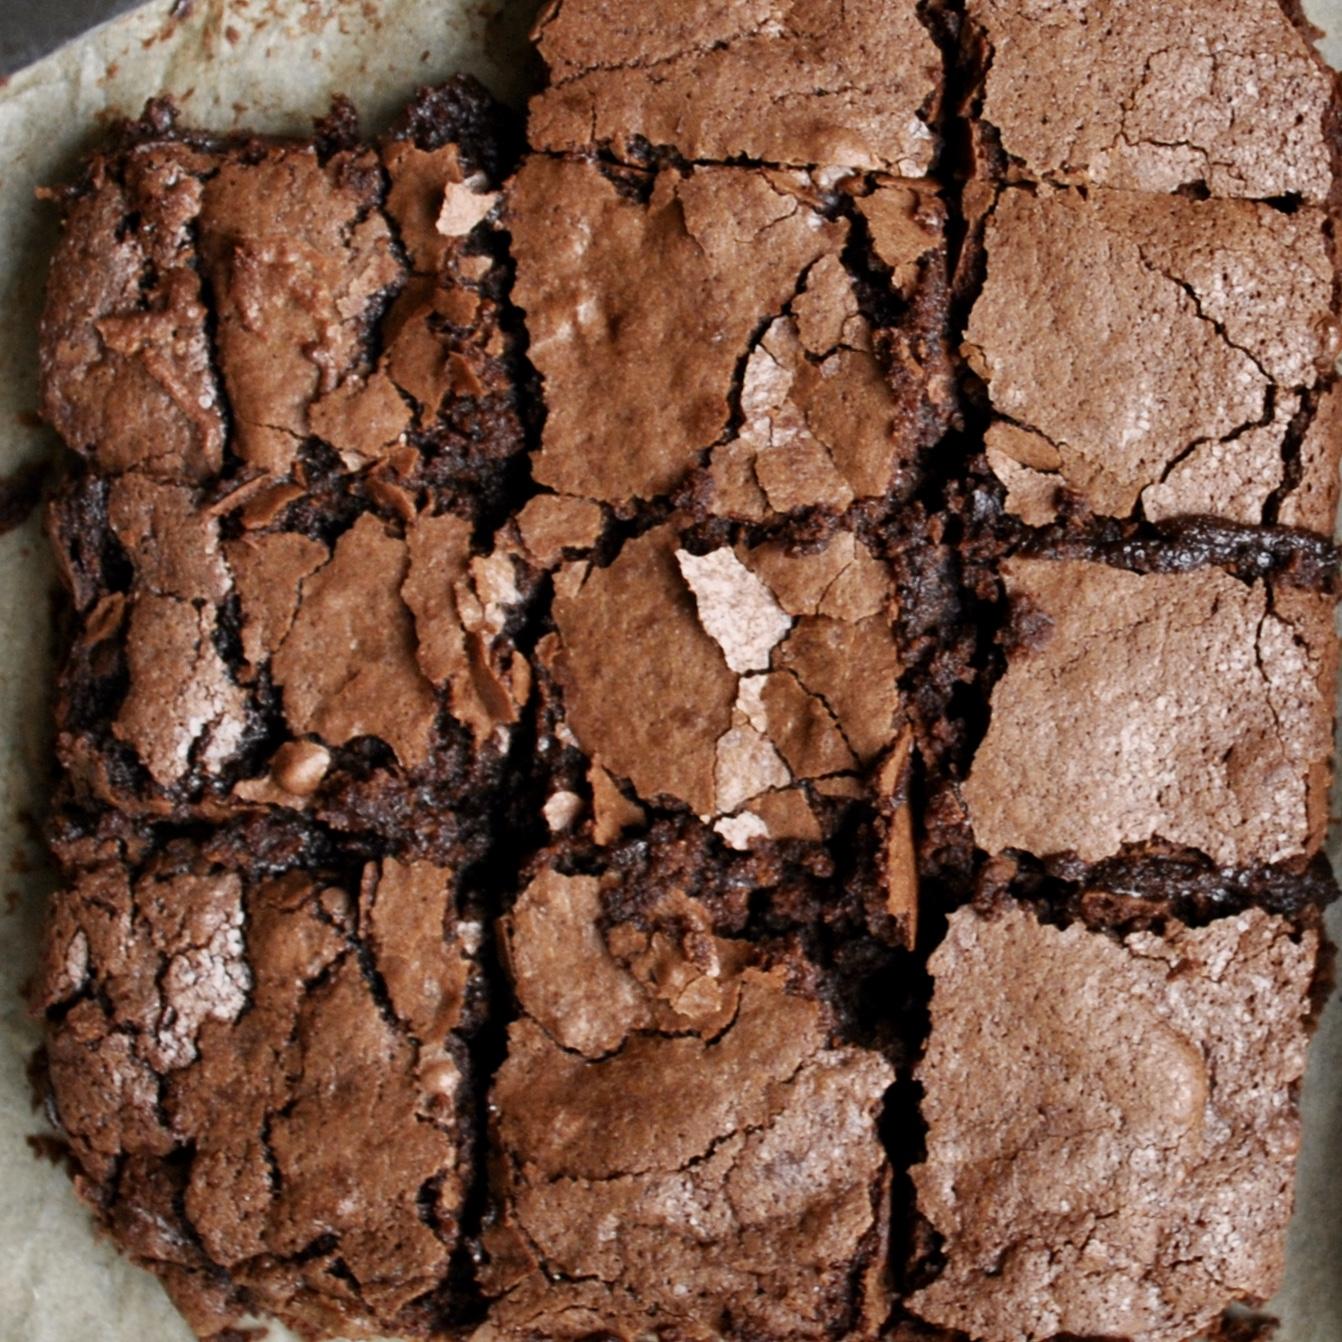 Gooey Chocolate Brownies